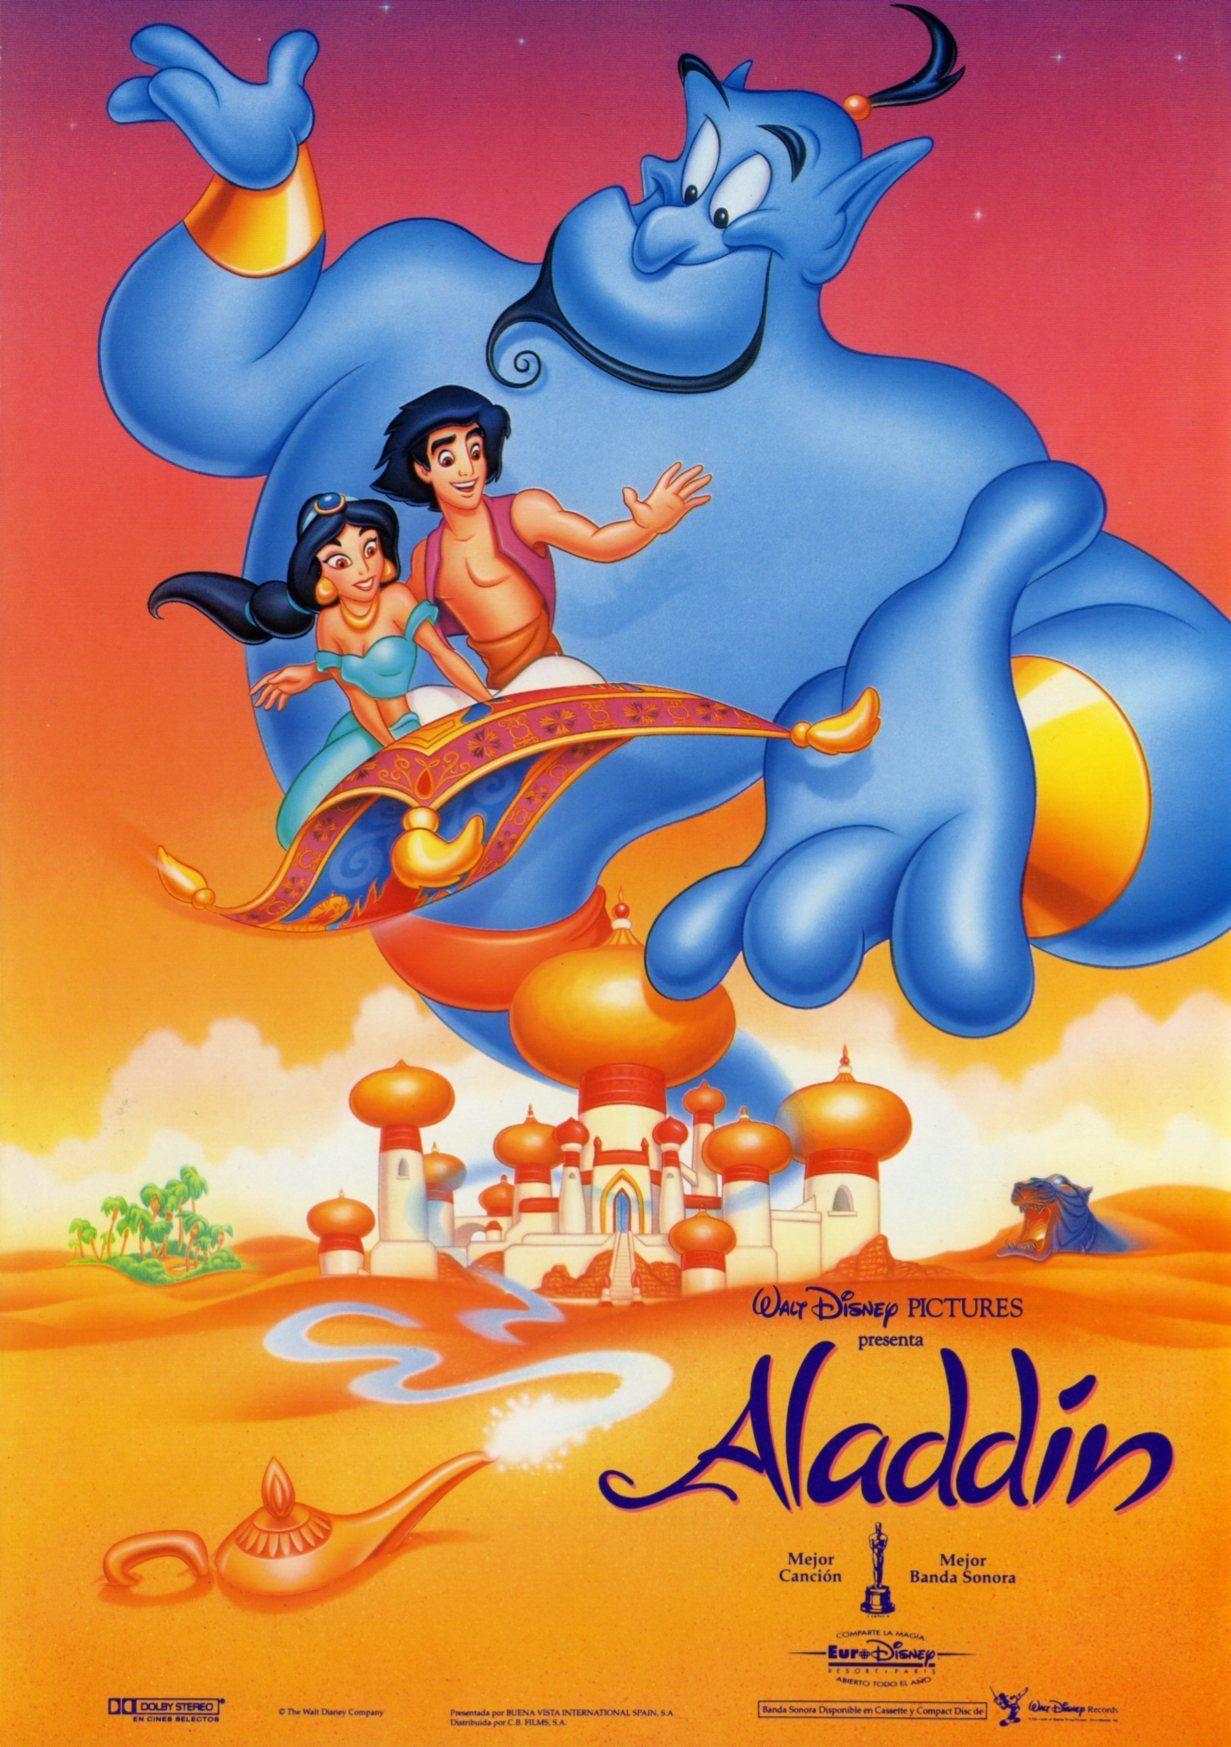 Aladdin Carteles De Peliculas De Disney Carteles De Disney Peliculas De Animacion